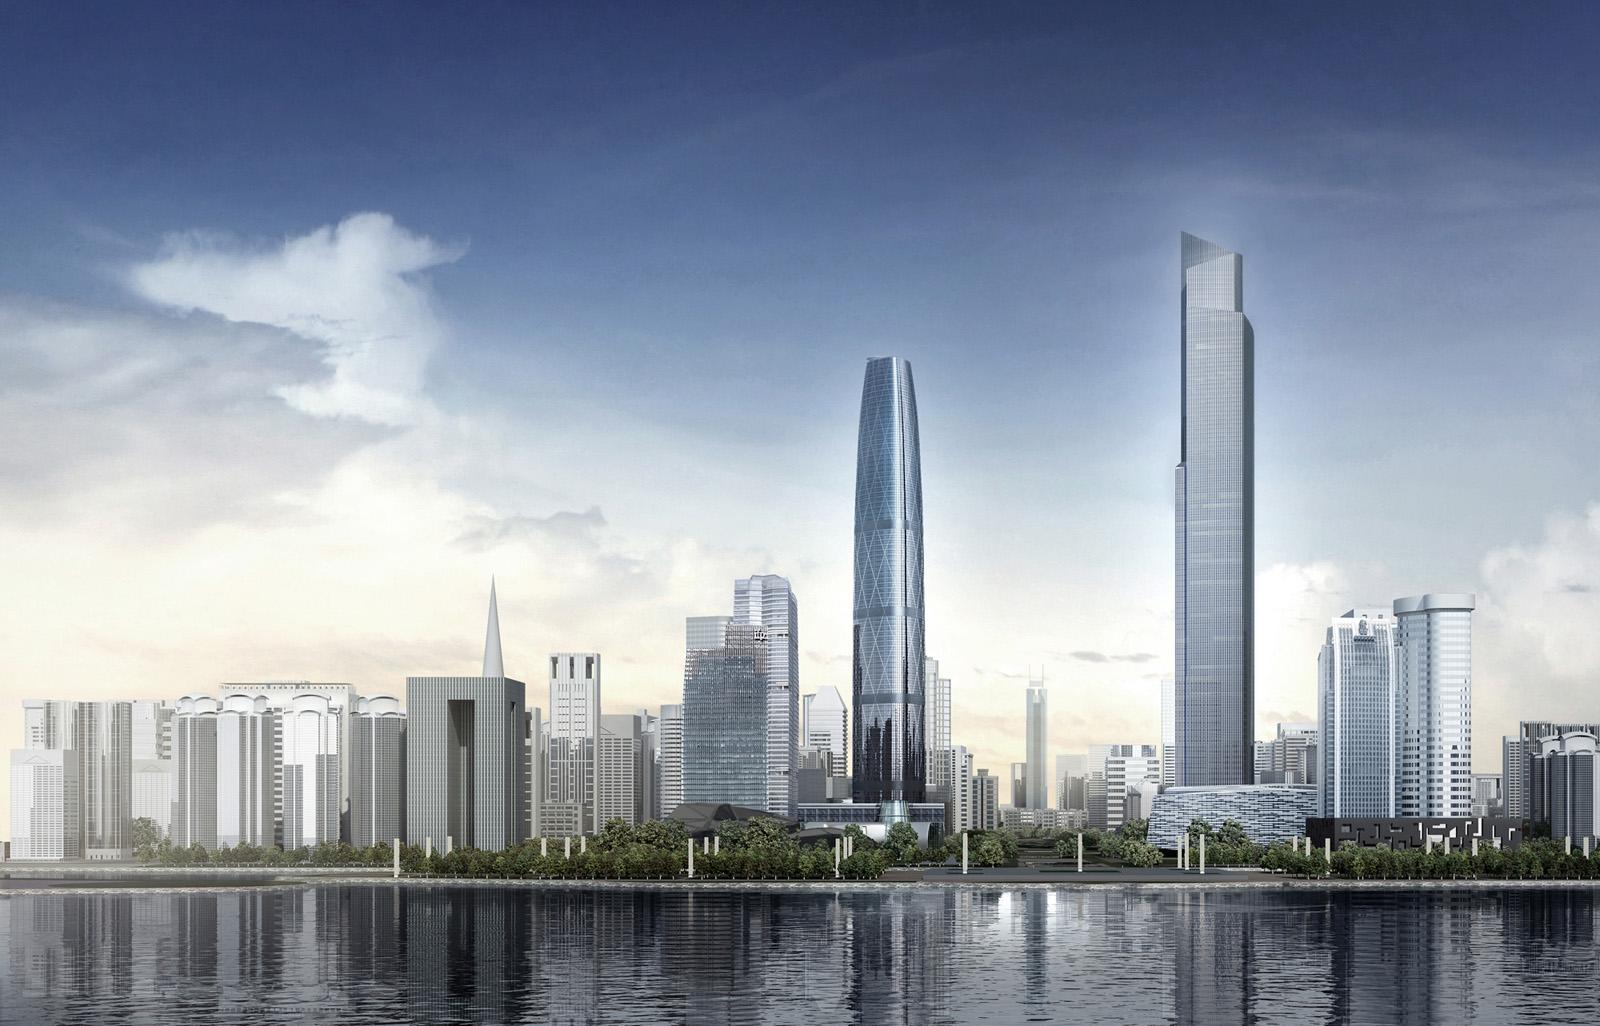 Modern Cabinet: The Chow Tai Fook Skyscraper, Guangzhou, China